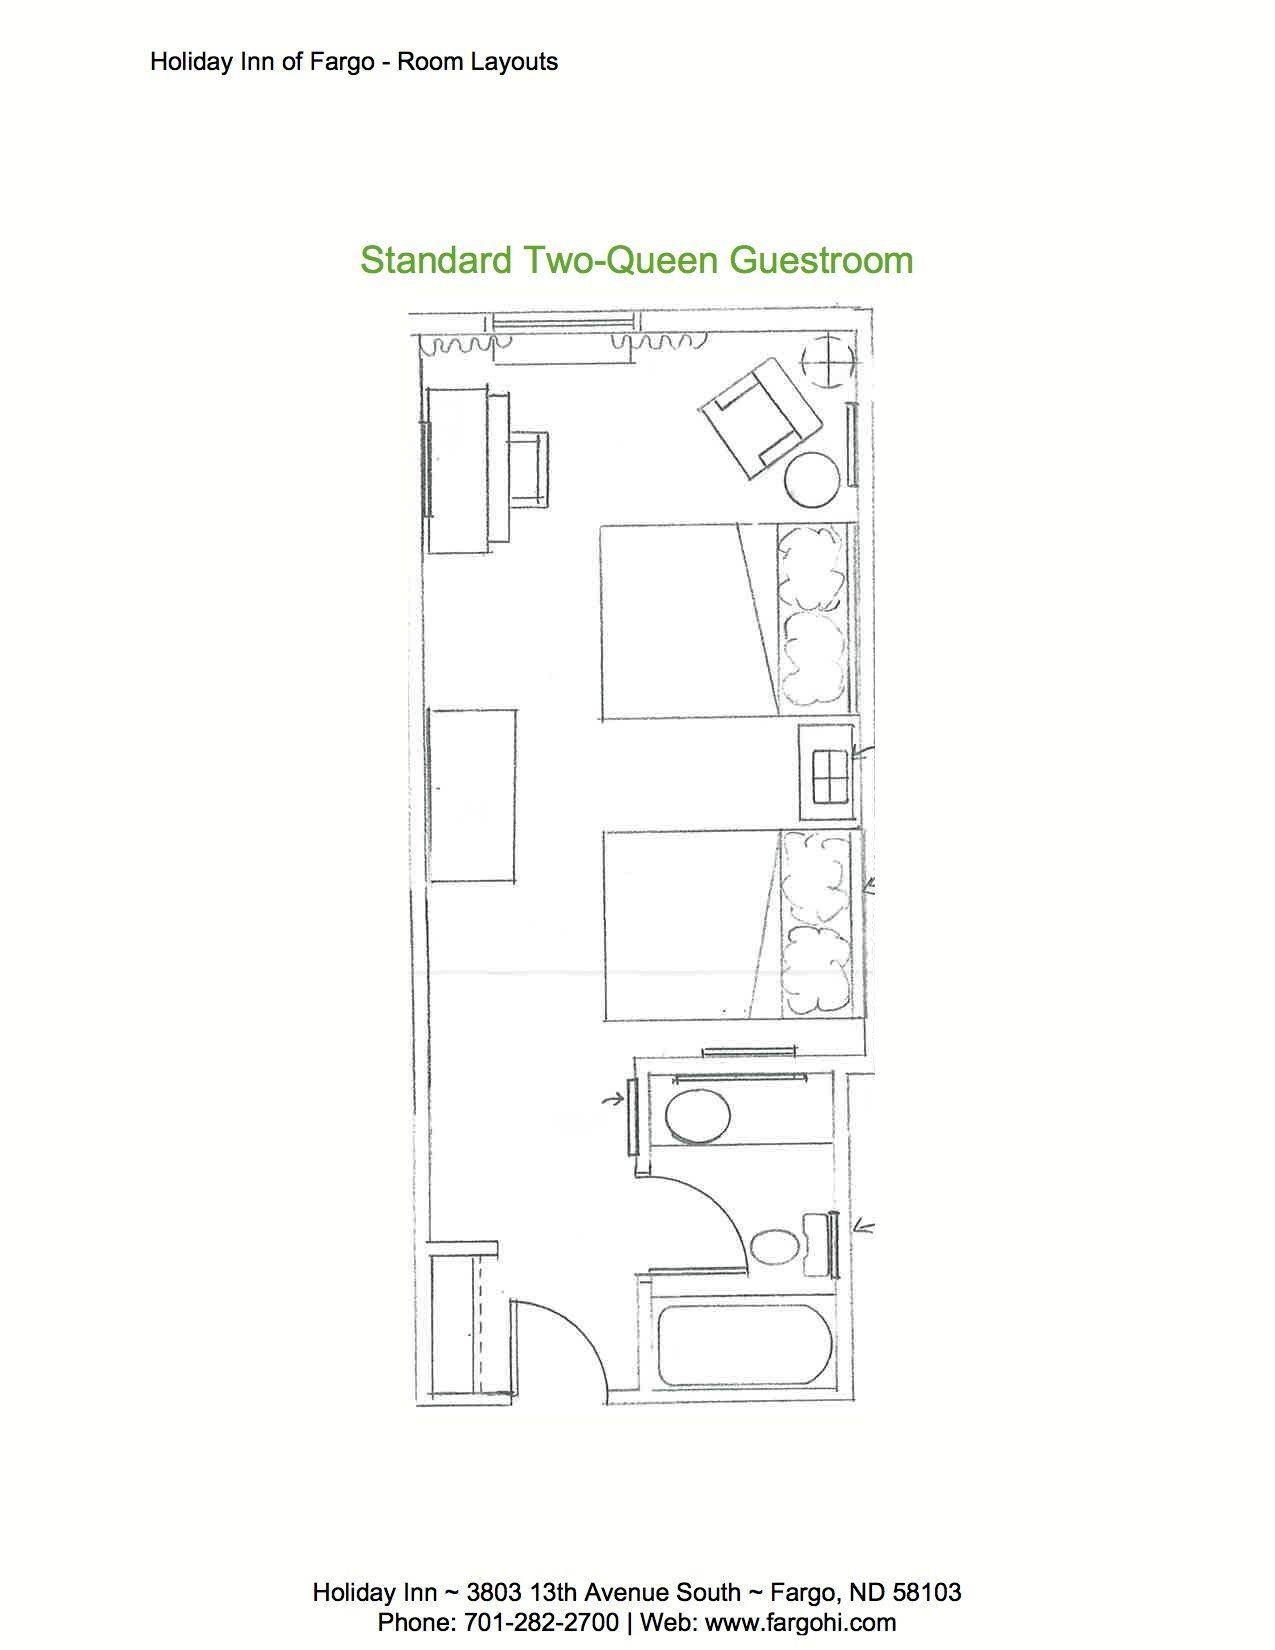 Standard Hotel Room: Standard Hotel Rooms Fargo, ND & Moorhead, MN